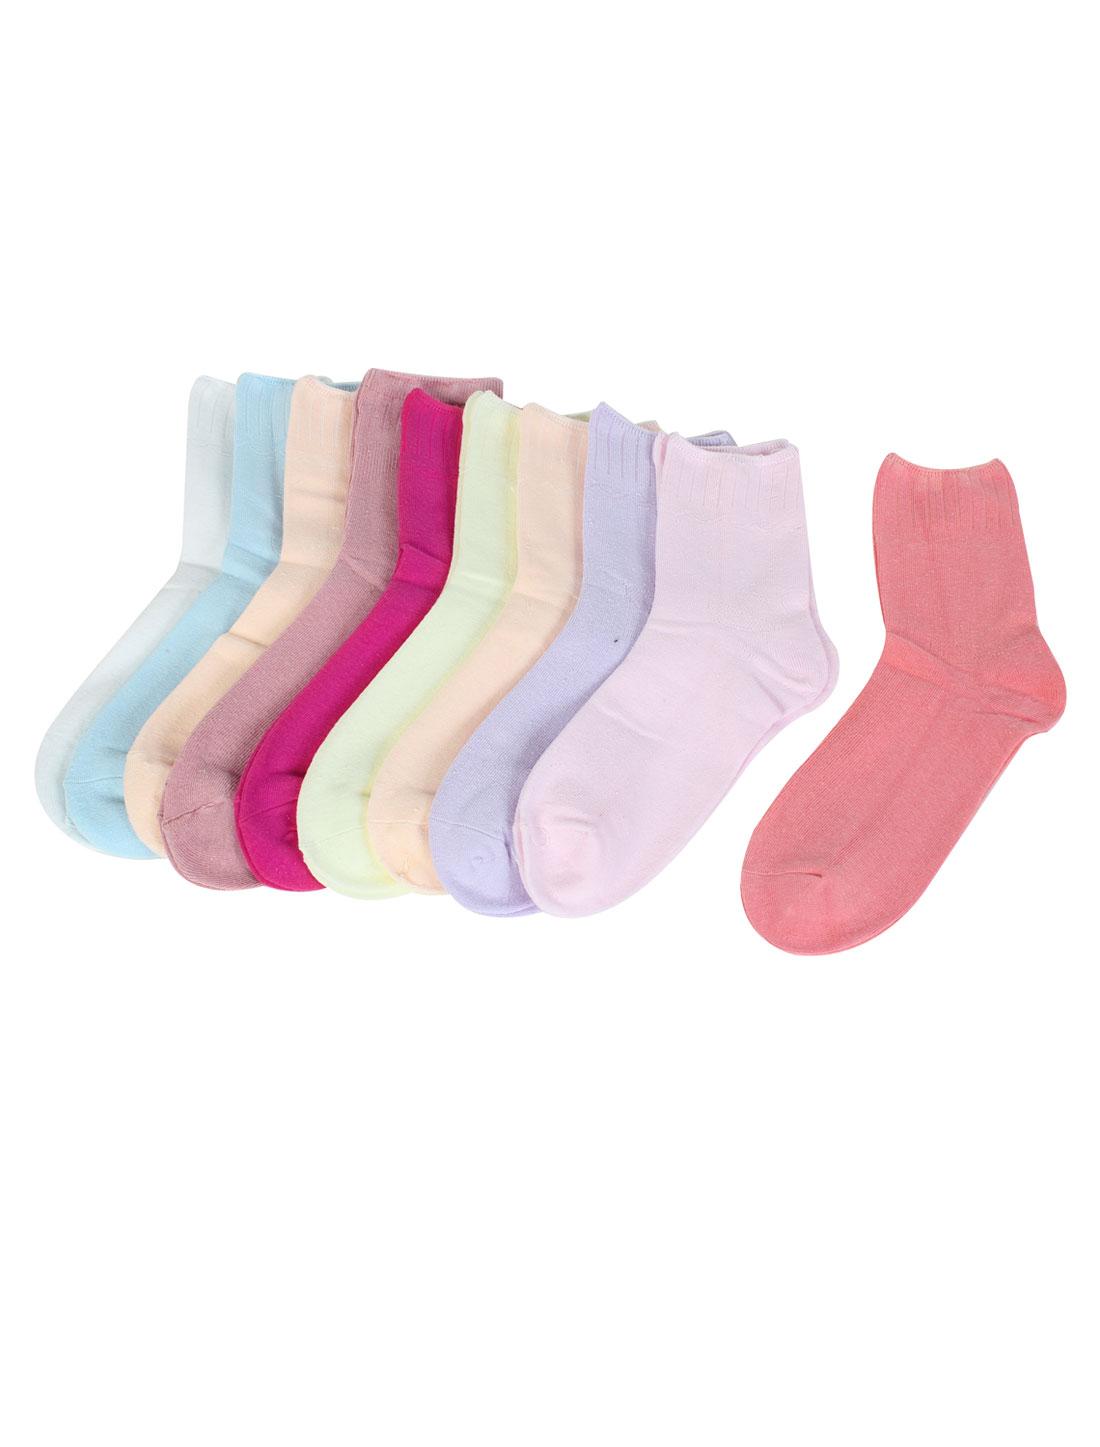 Ladies Multicolor Knited Elastic Ankle High Casual Socks 10 Pairs